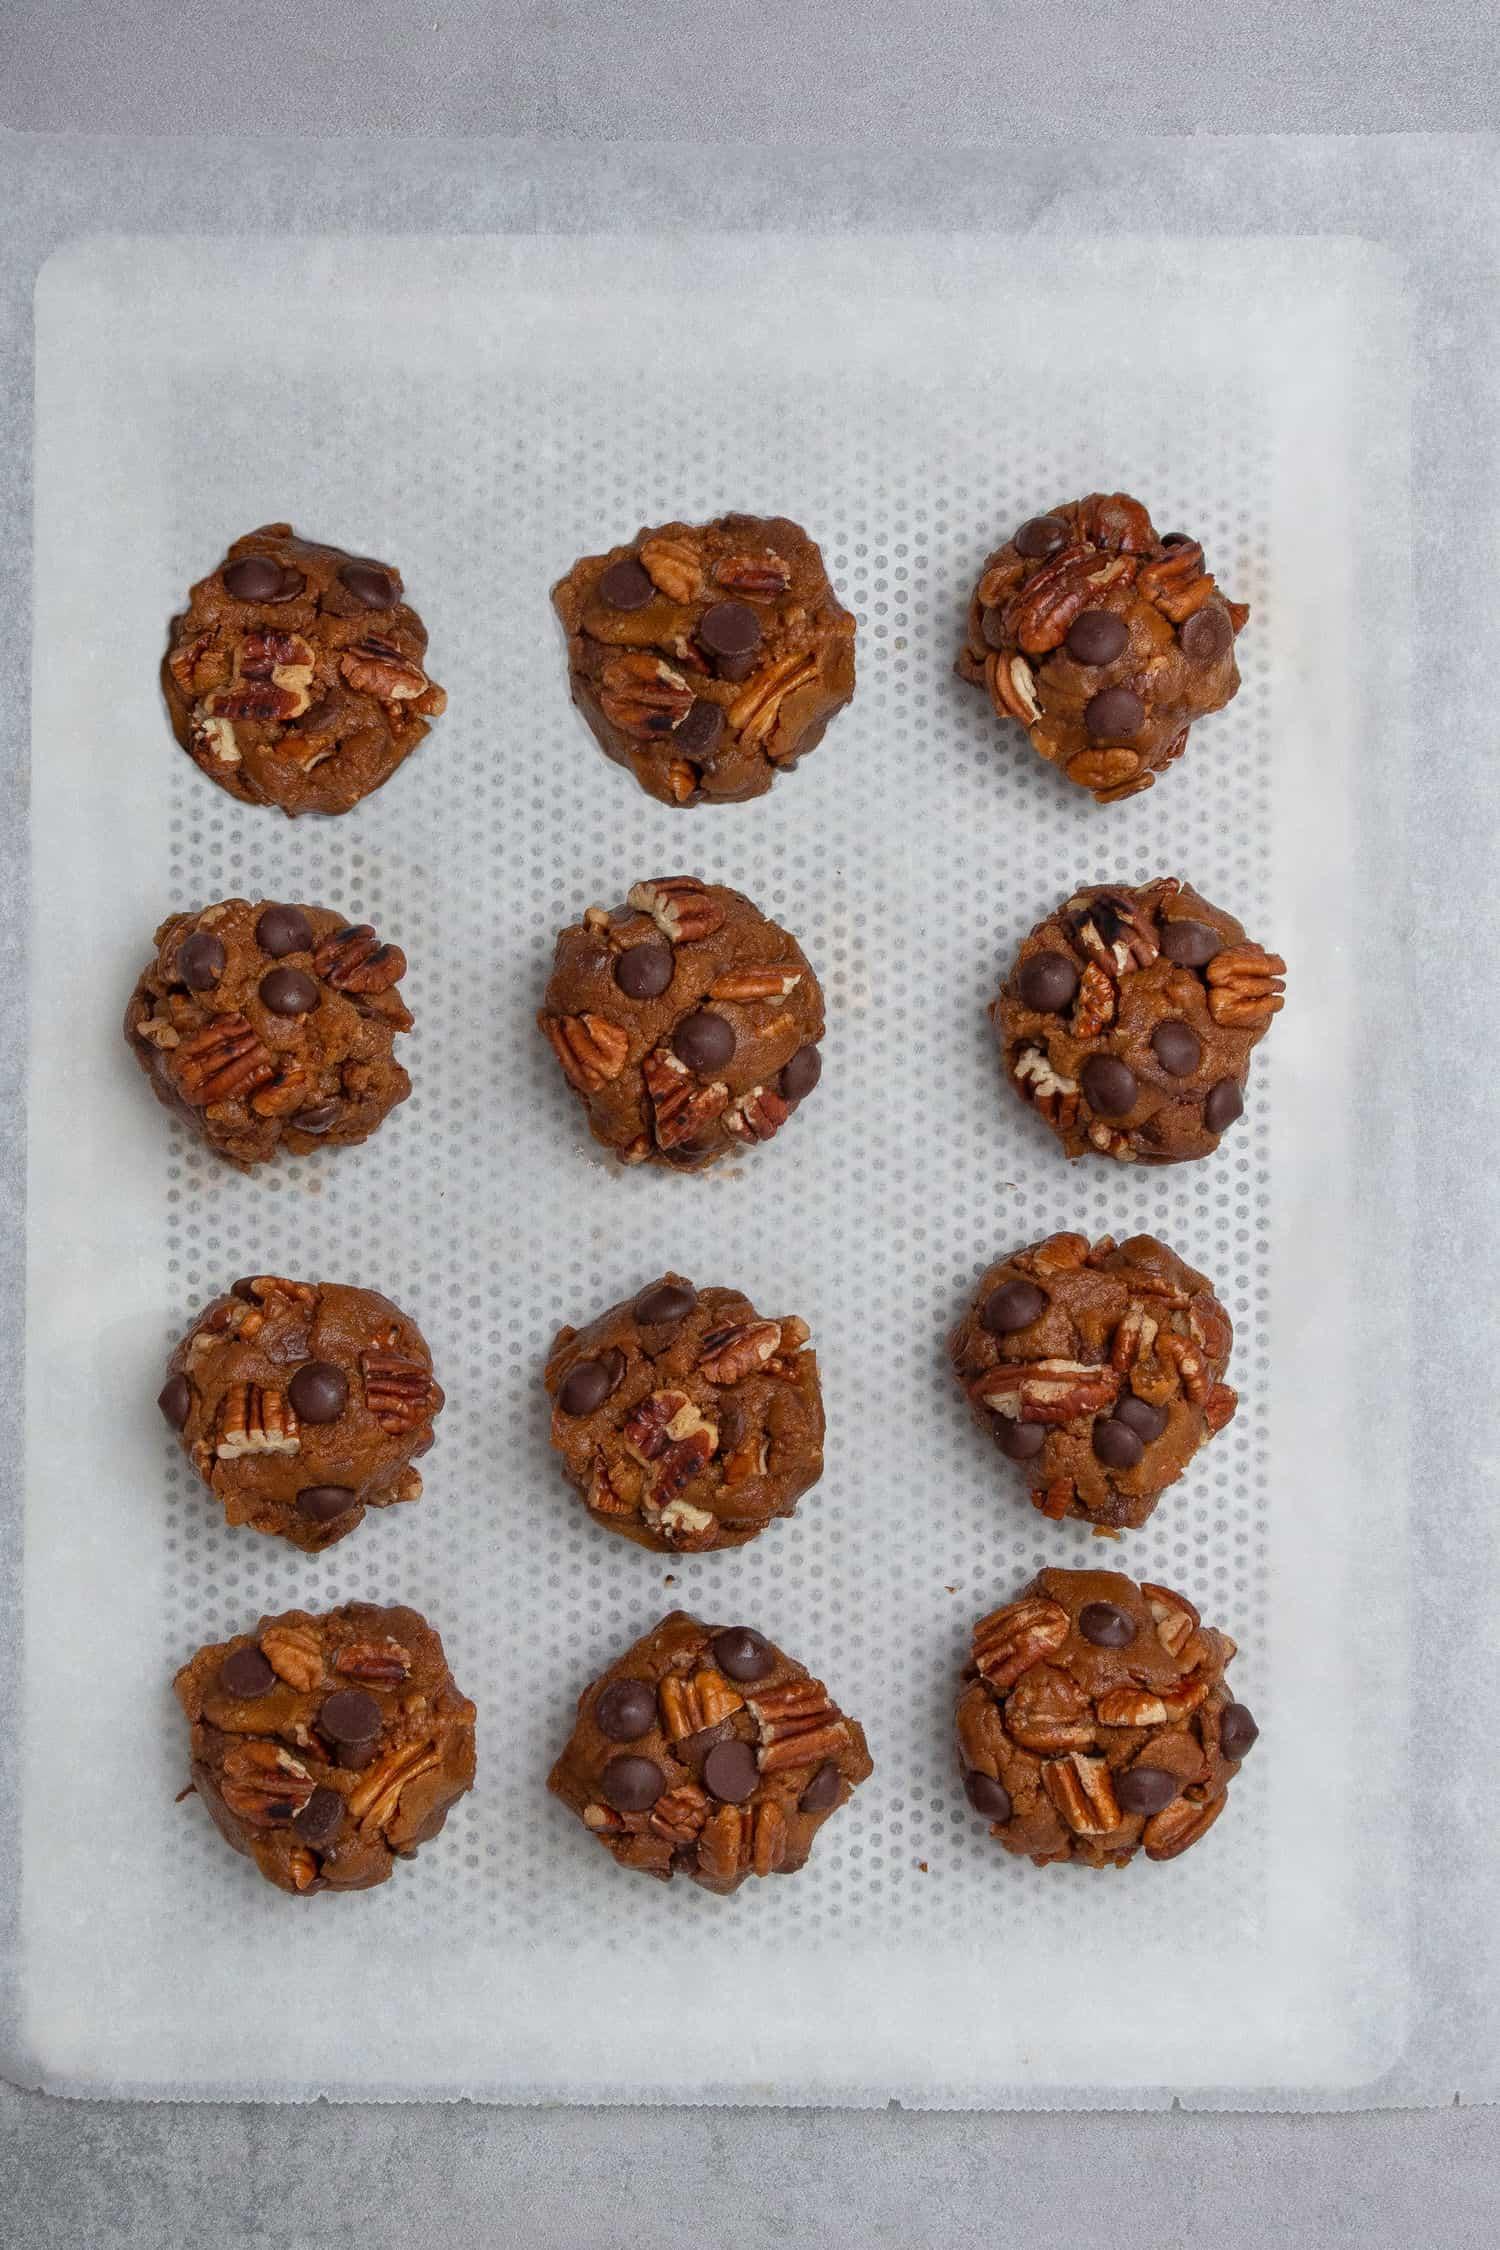 Pecan chocolate chip cookies process